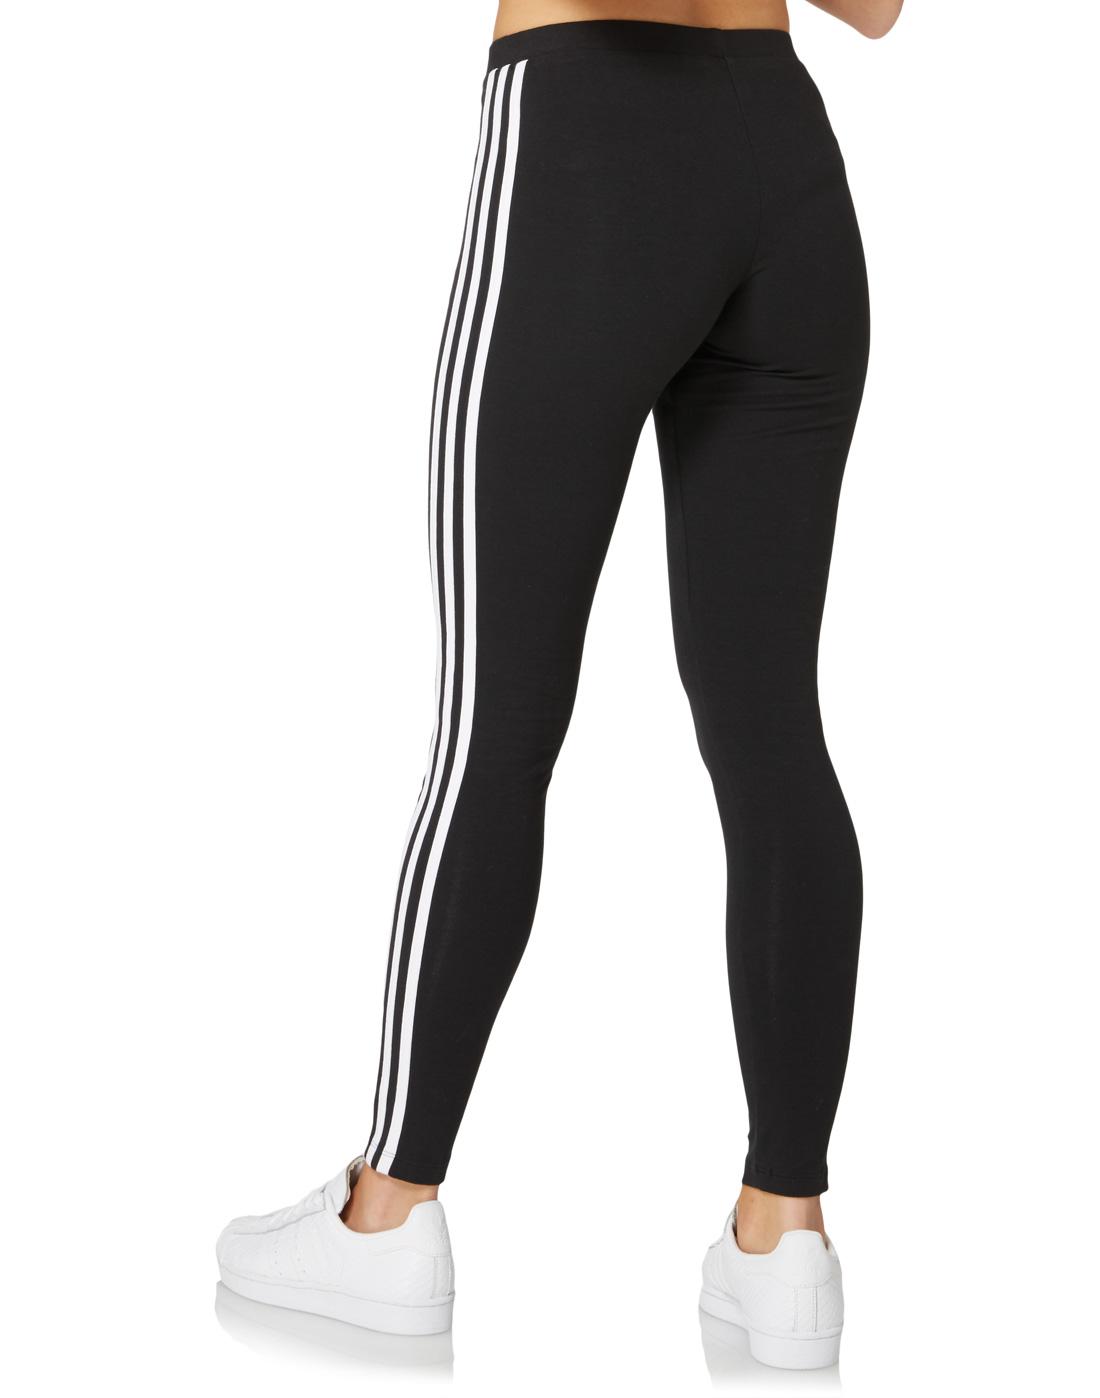 7342b2e80f022 adidas Originals Womens 3 Stripe Legging   Life Style Sports